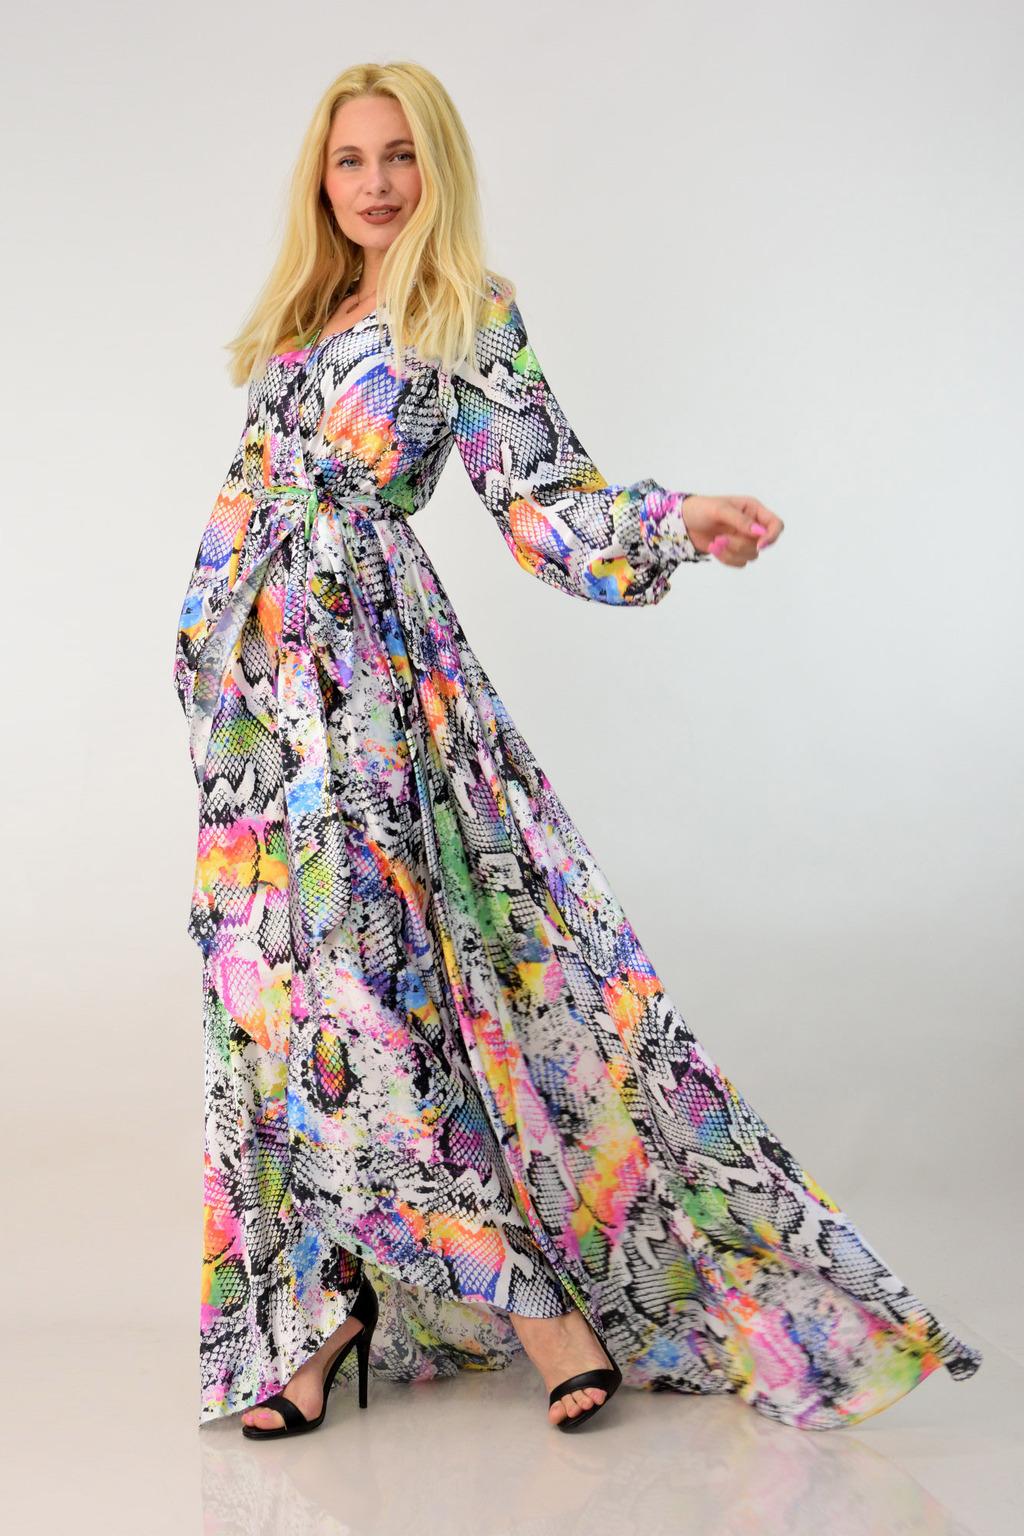 0b651576bc35 Μακρύ φόρεμα επίσημο. Tap to expand